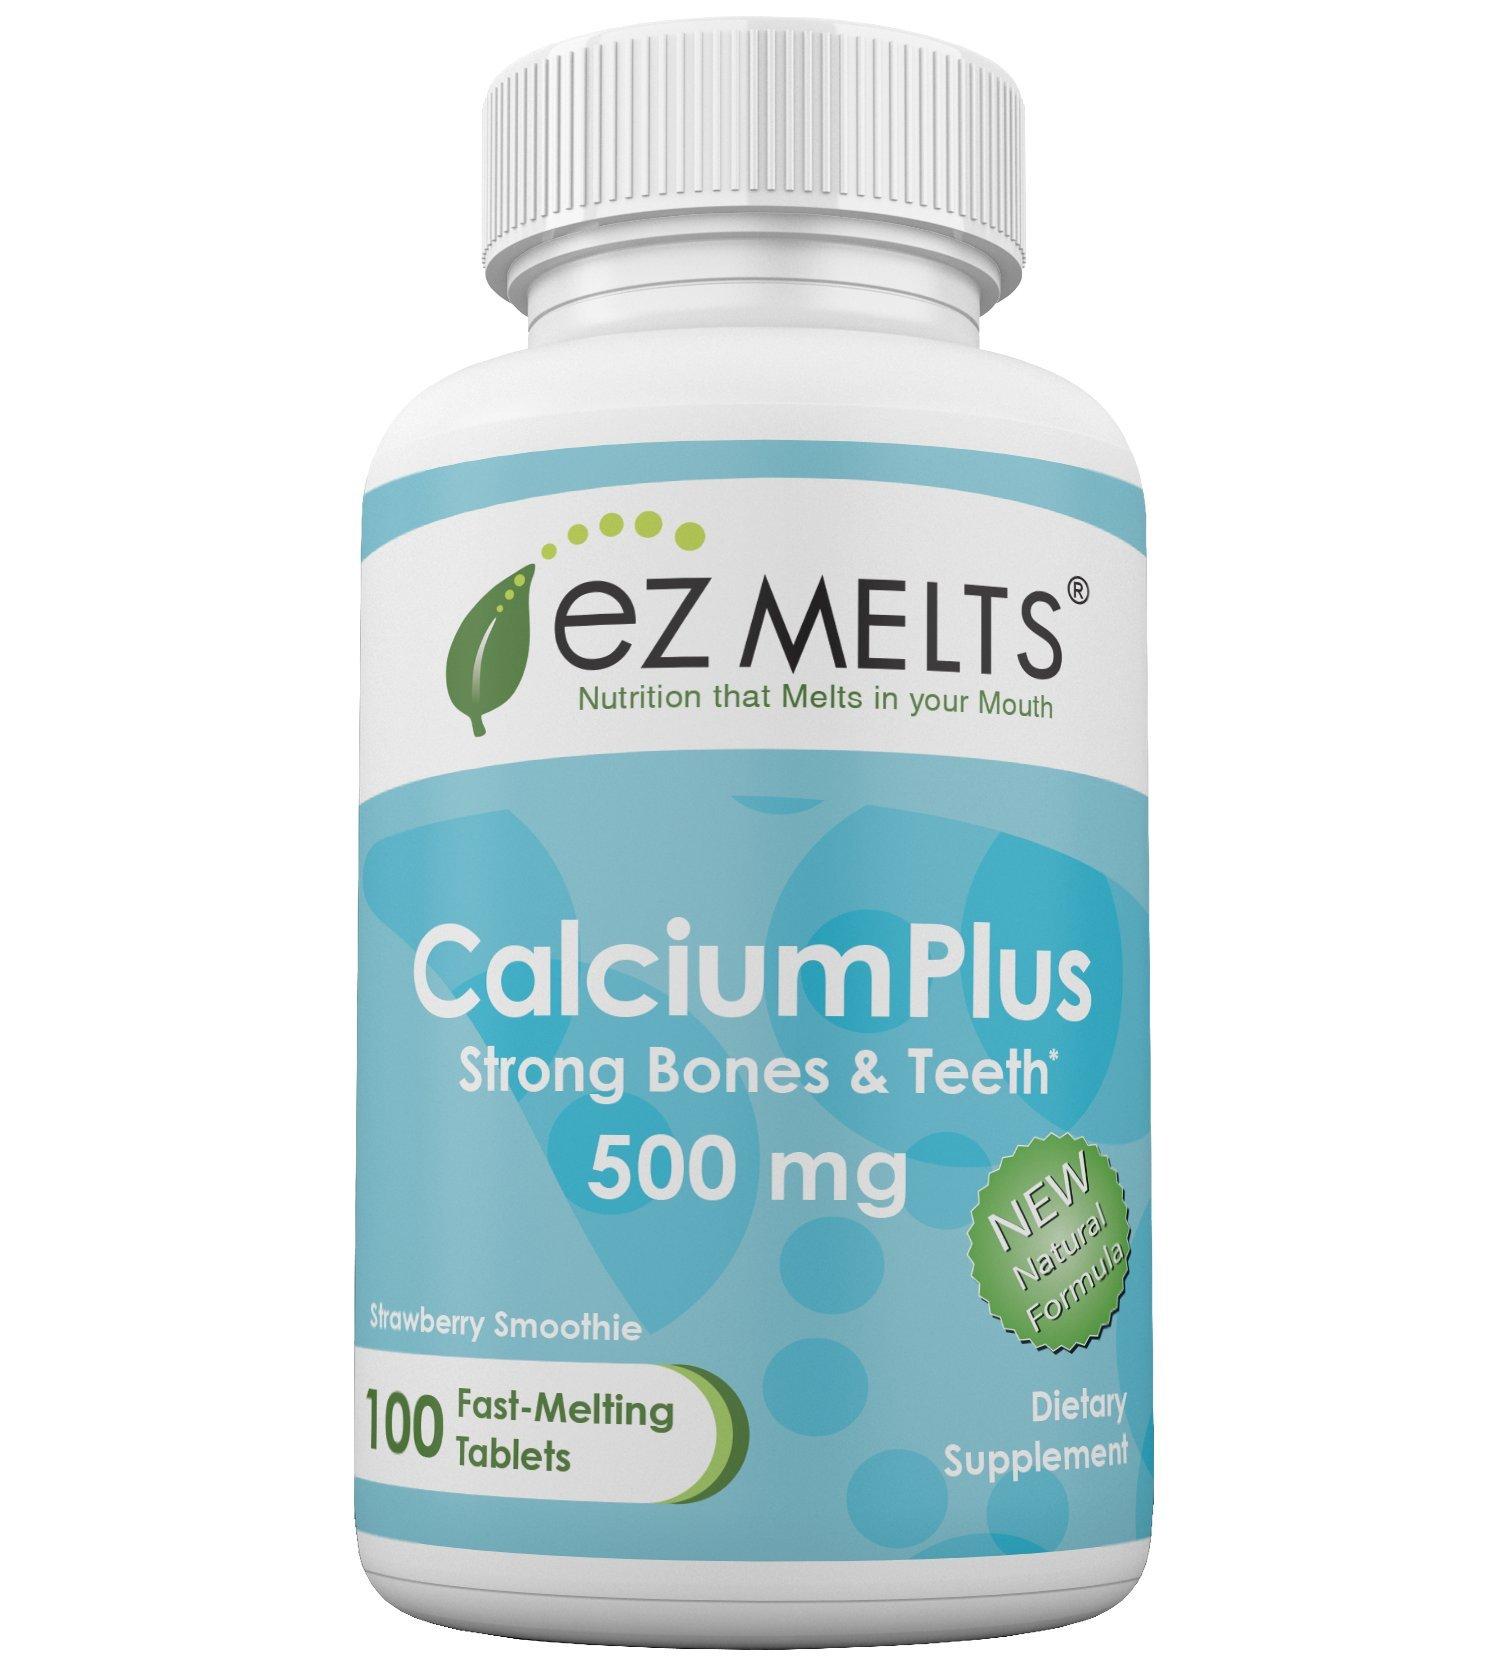 EZ Melts Calcium Plus, 500 mg, Dissolvable Vitamins, Vegetarian, Zero Sugar, Natural Strawberry Flavor, 100 Fast Melting Tablets, Calcium Supplement